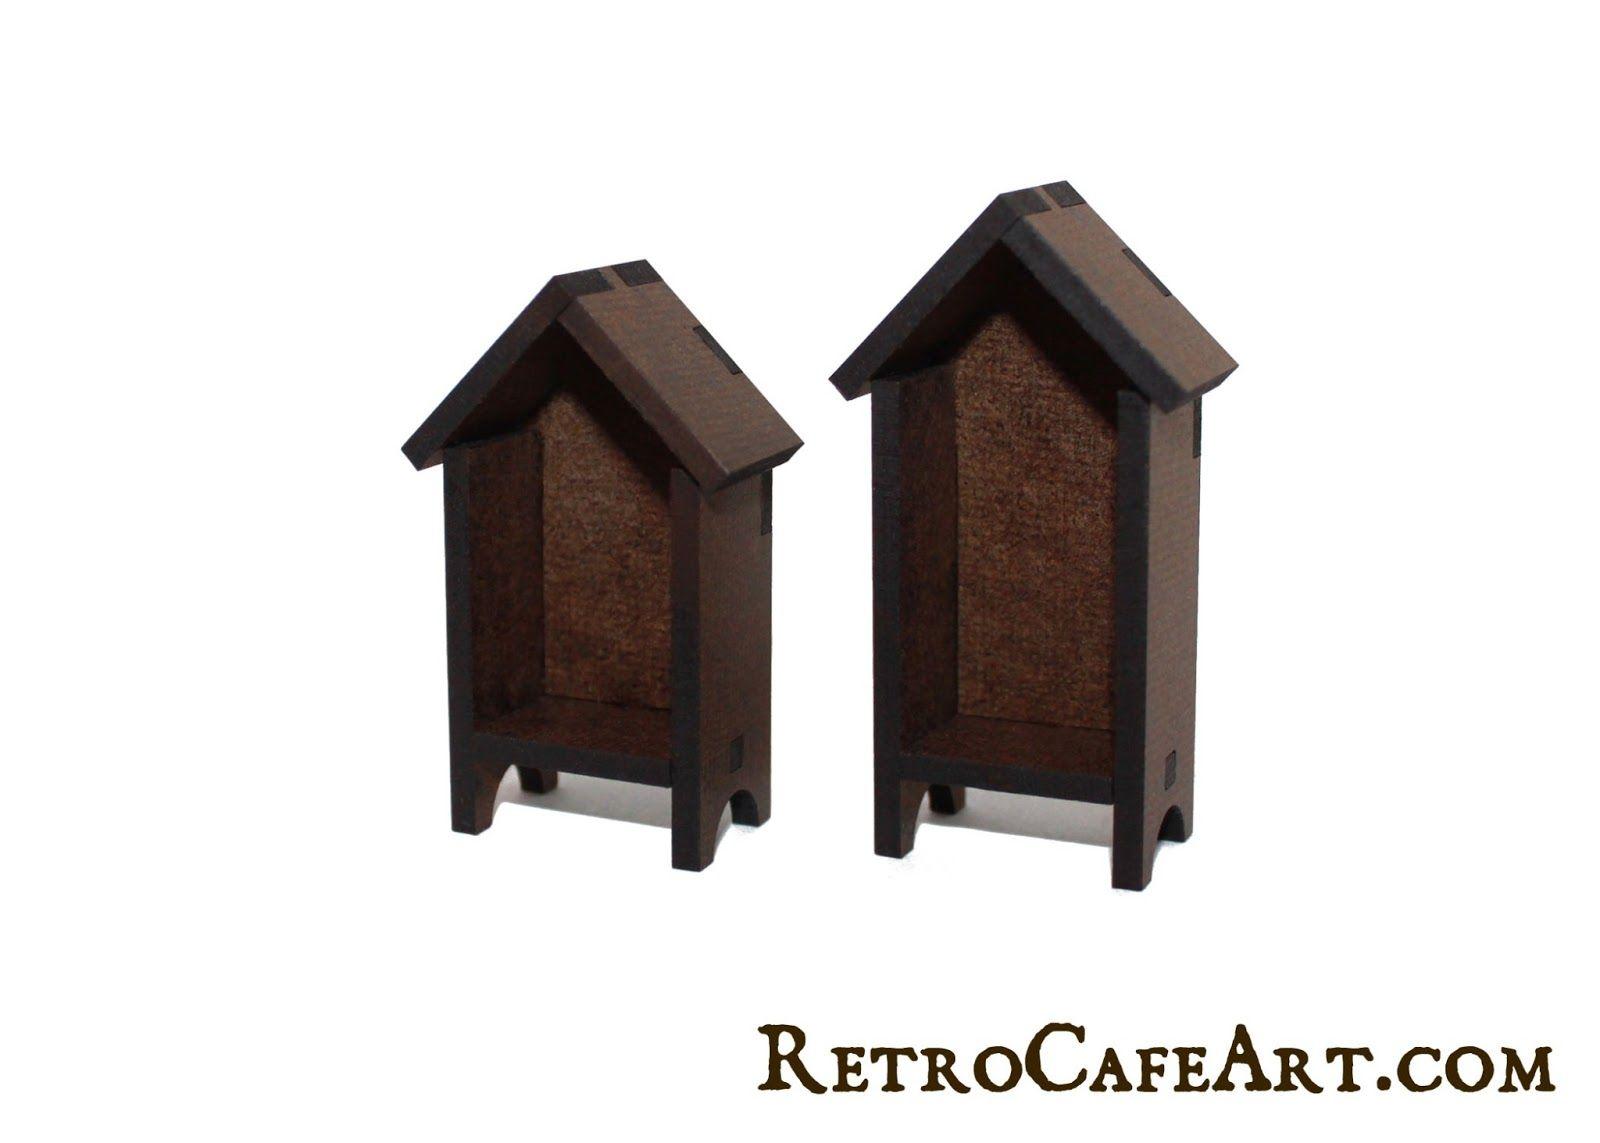 Mini House Hutch Shrine Kits from www.RetroCafeArt.com